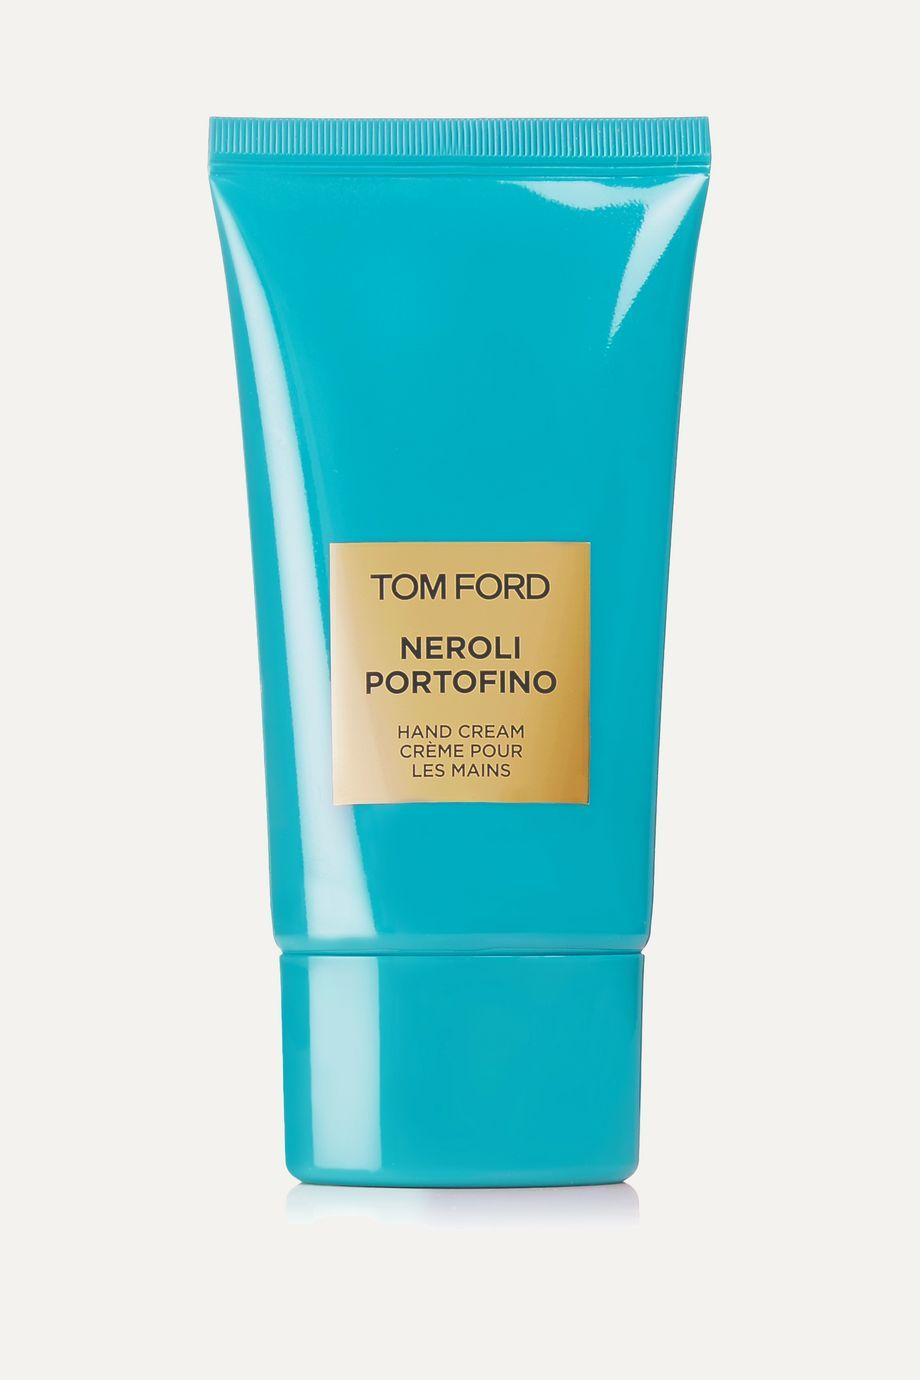 TOM FORD BEAUTY Neroli Portofino Hand Cream, 75ml